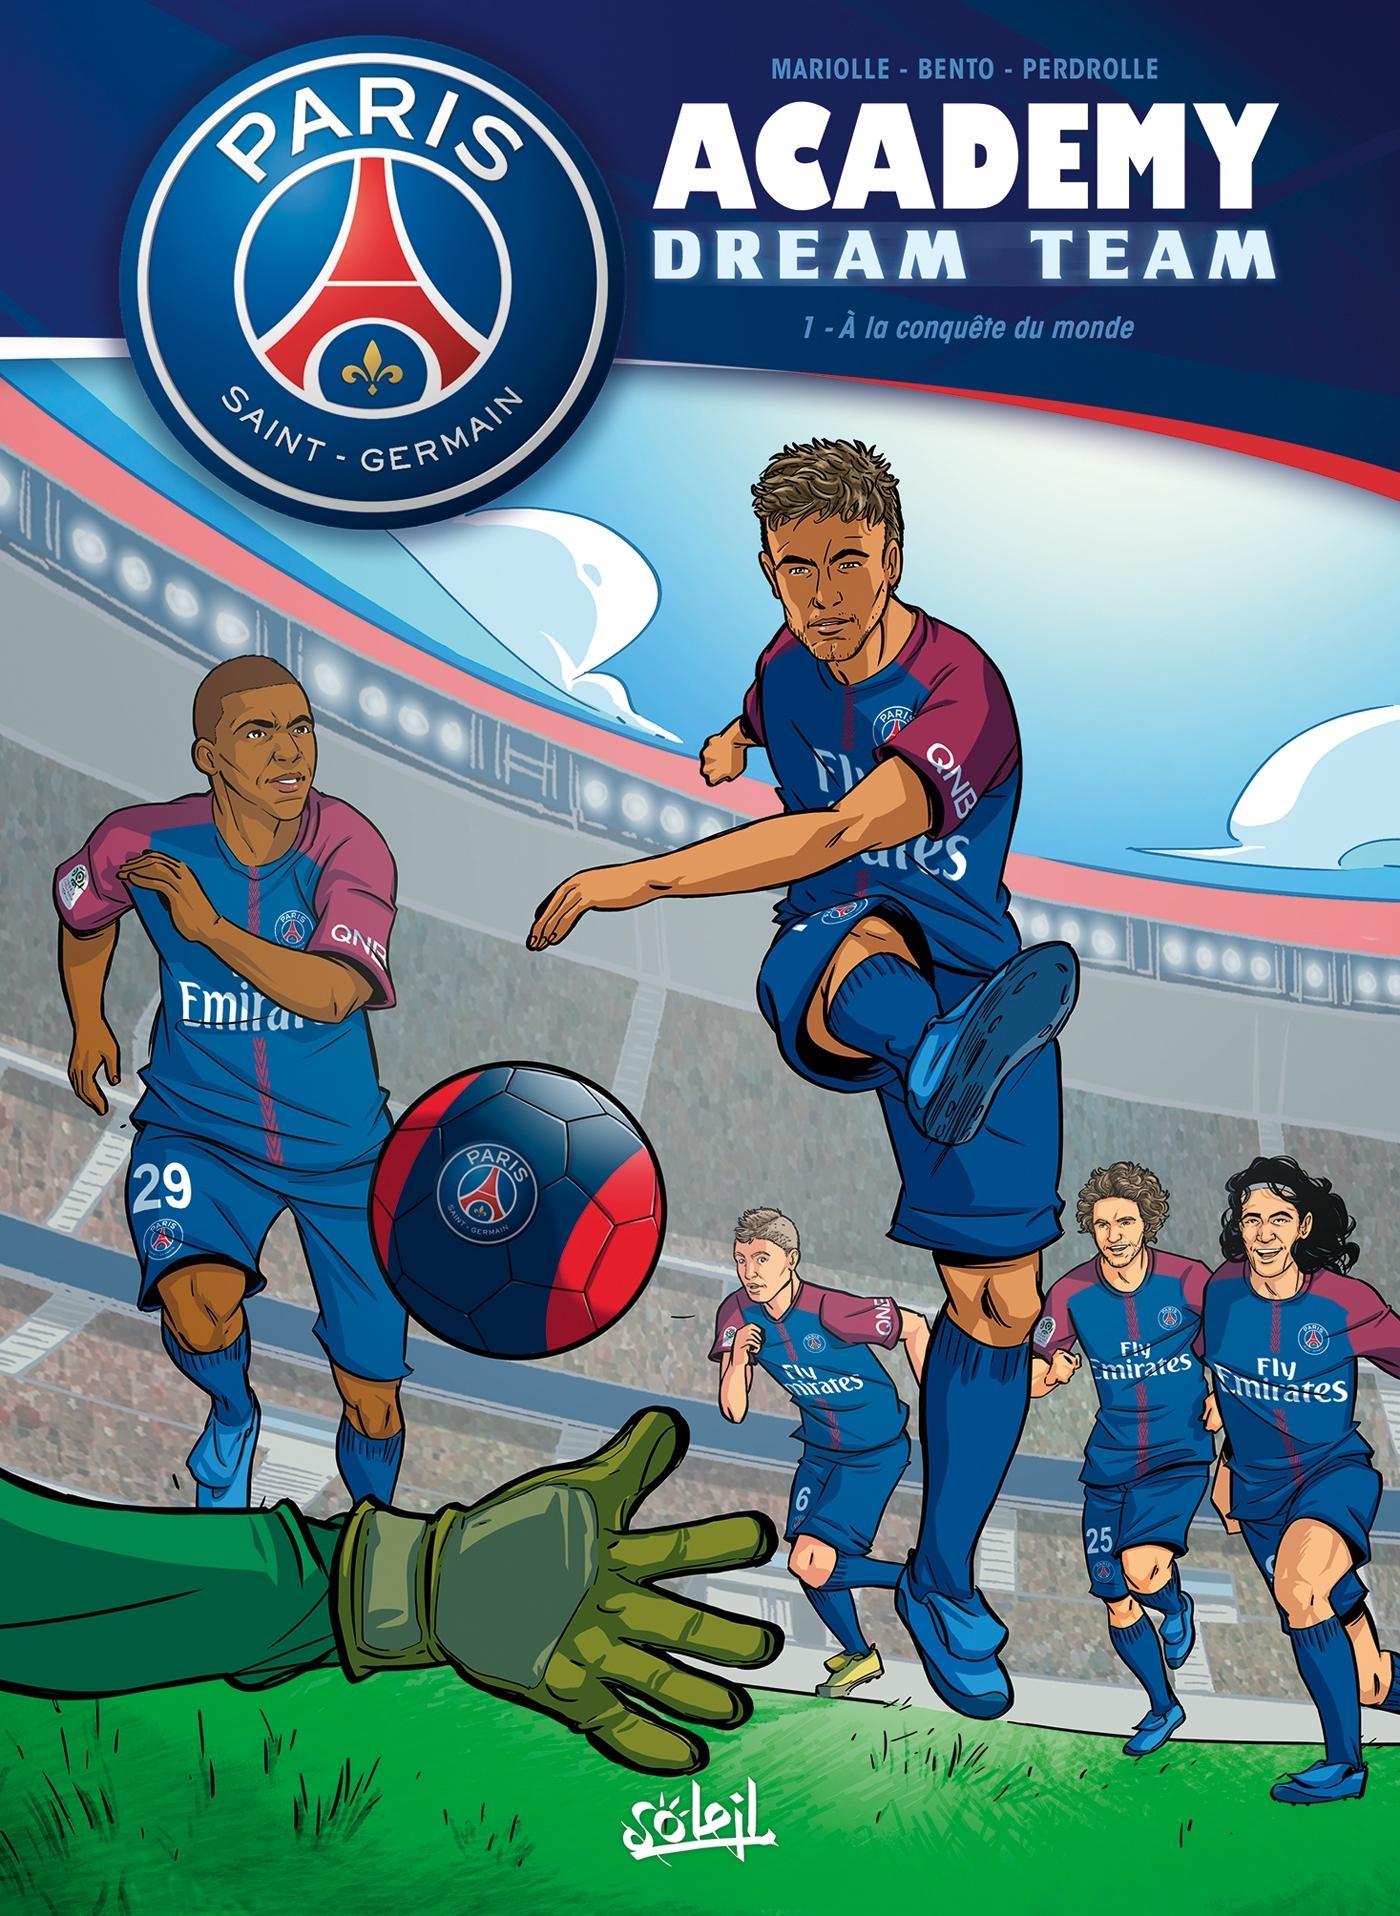 PARIS SAINT-GERMAIN ACADEMY DREAM TEAM 01